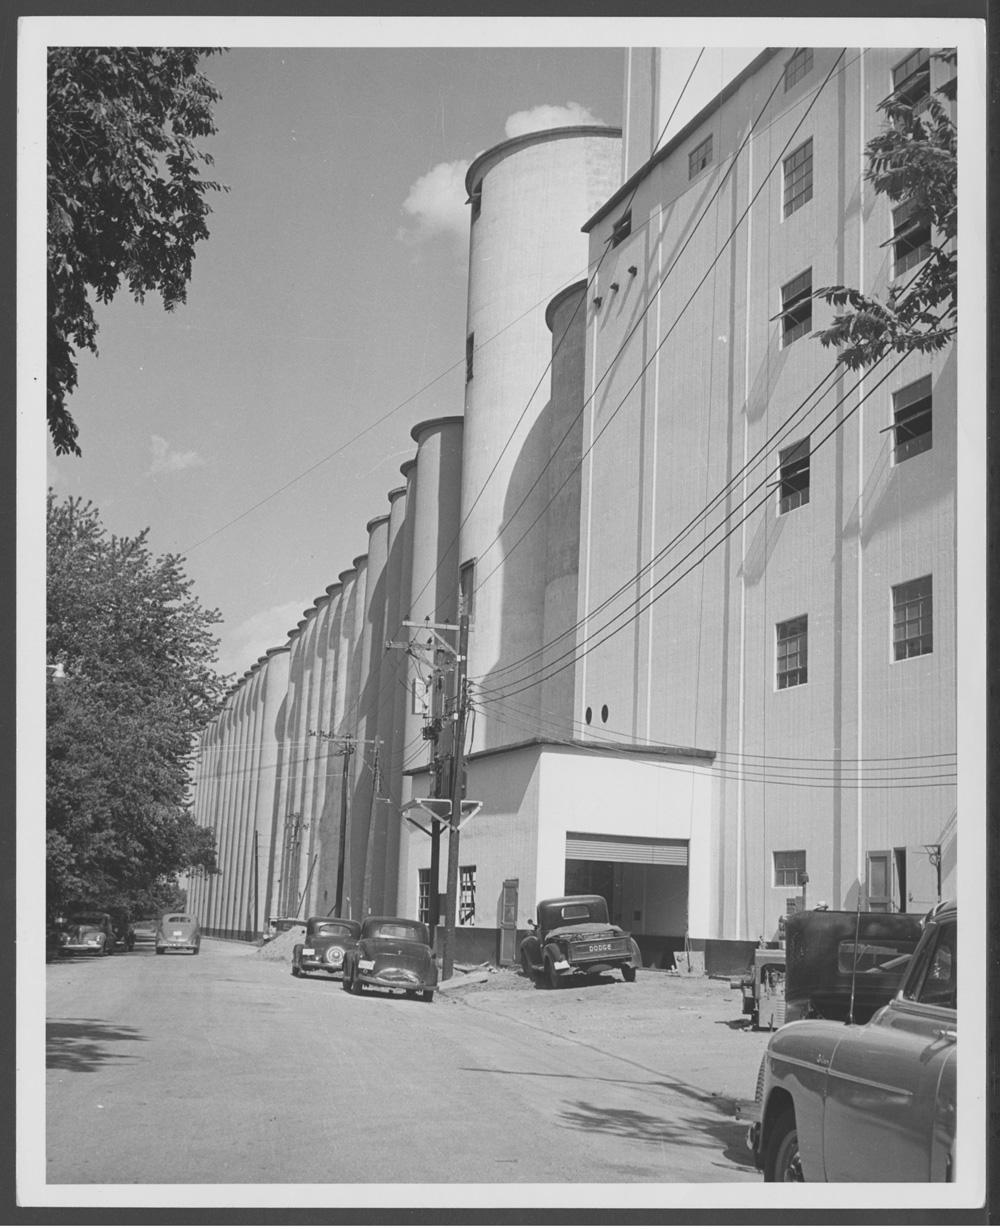 Flour mill & elevator, Abilene, Kansas - 1